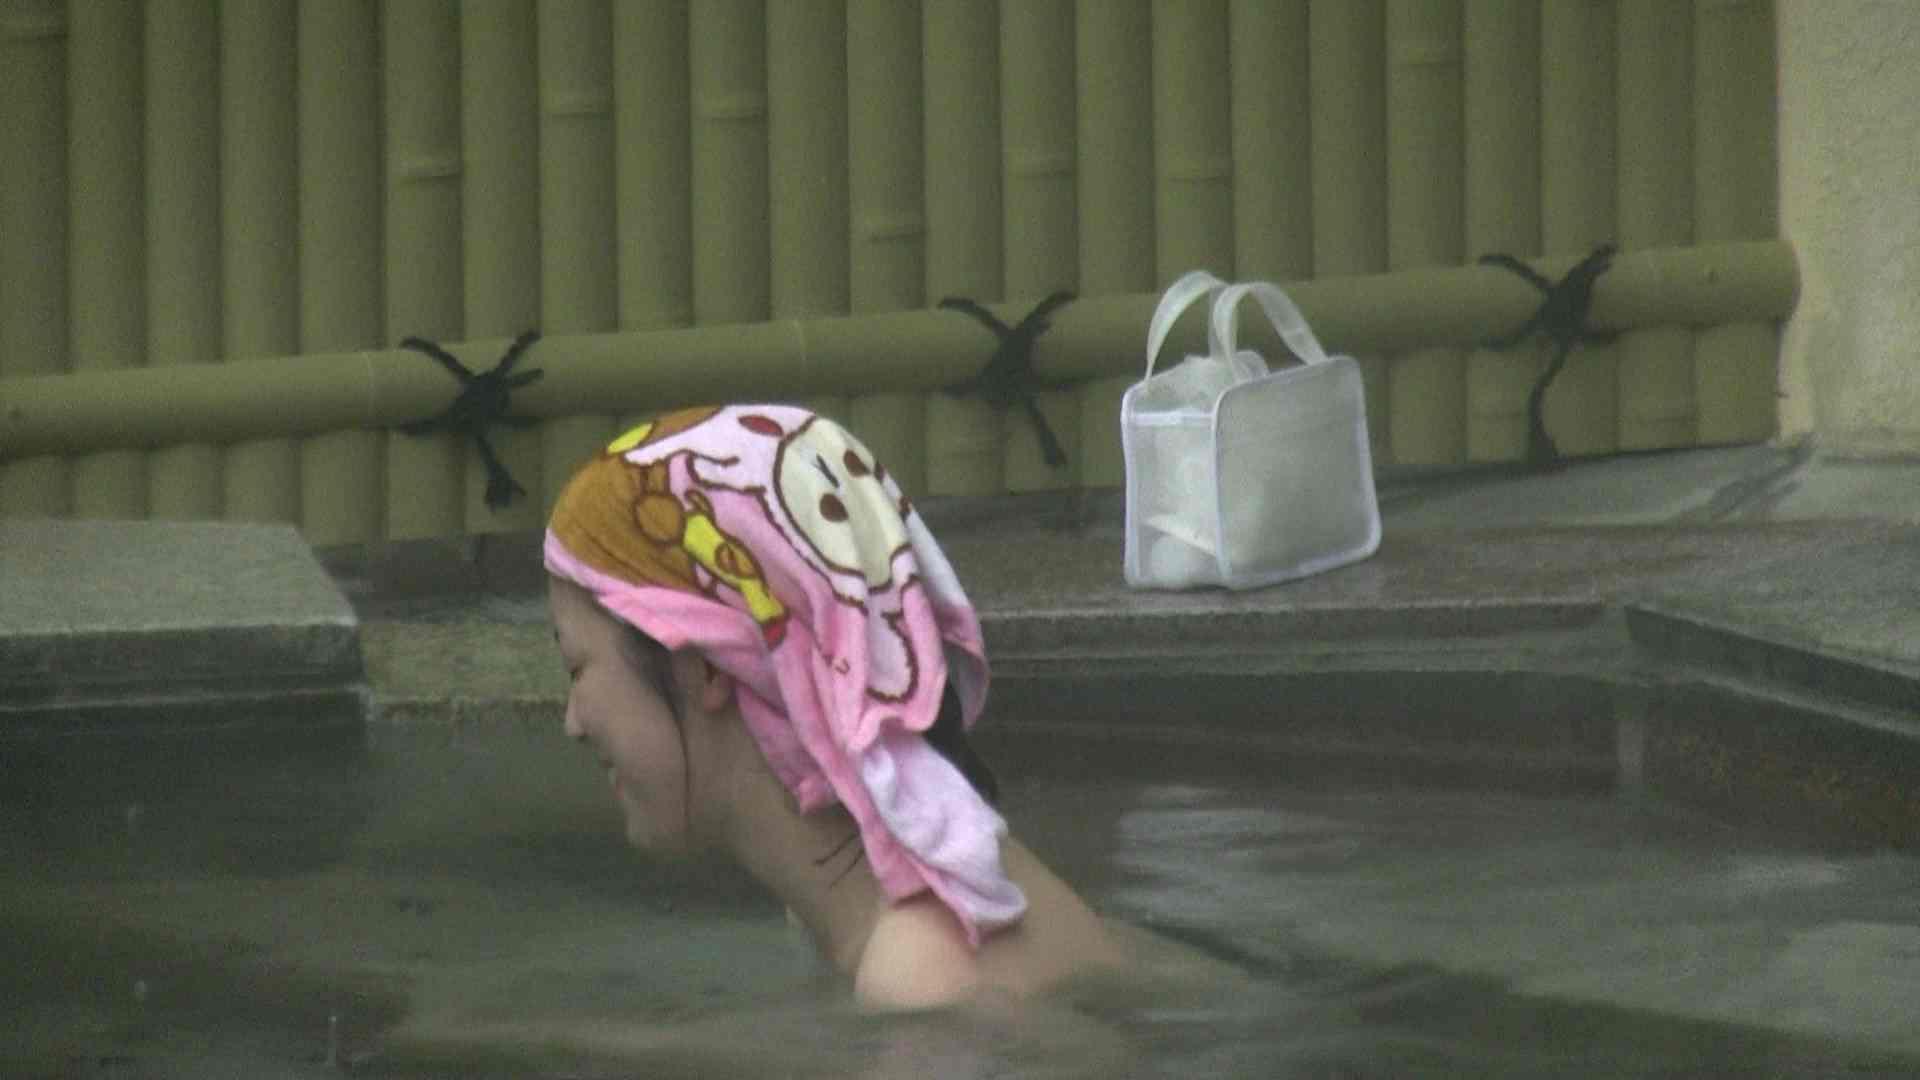 Aquaな露天風呂Vol.171 OLエロ画像 盗撮戯れ無修正画像 108PICs 98